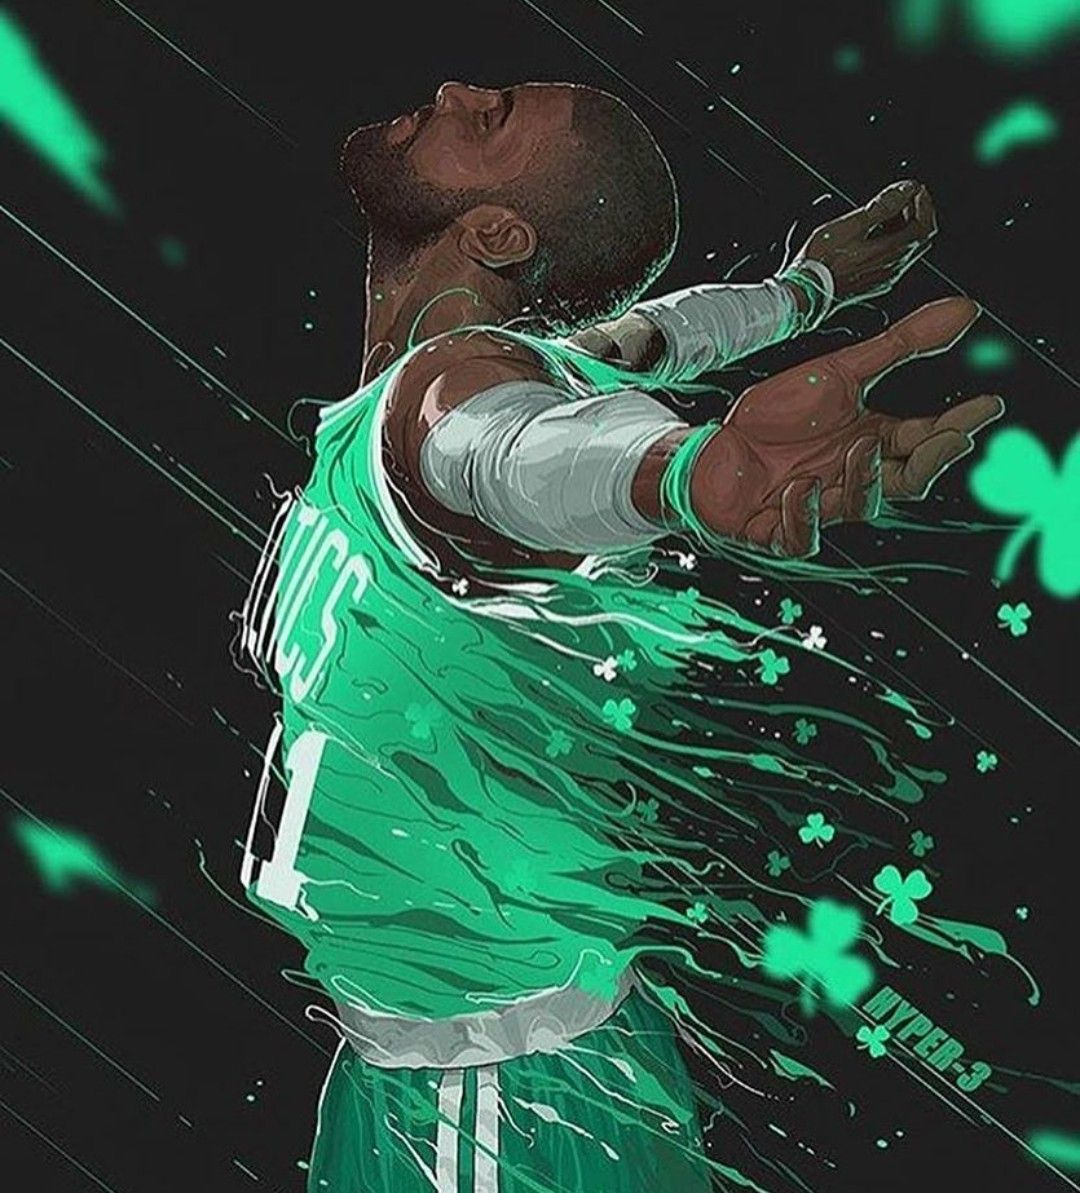 Kyrie Irving Wallpaper: Kyrie Irving Edit Boston Celtics